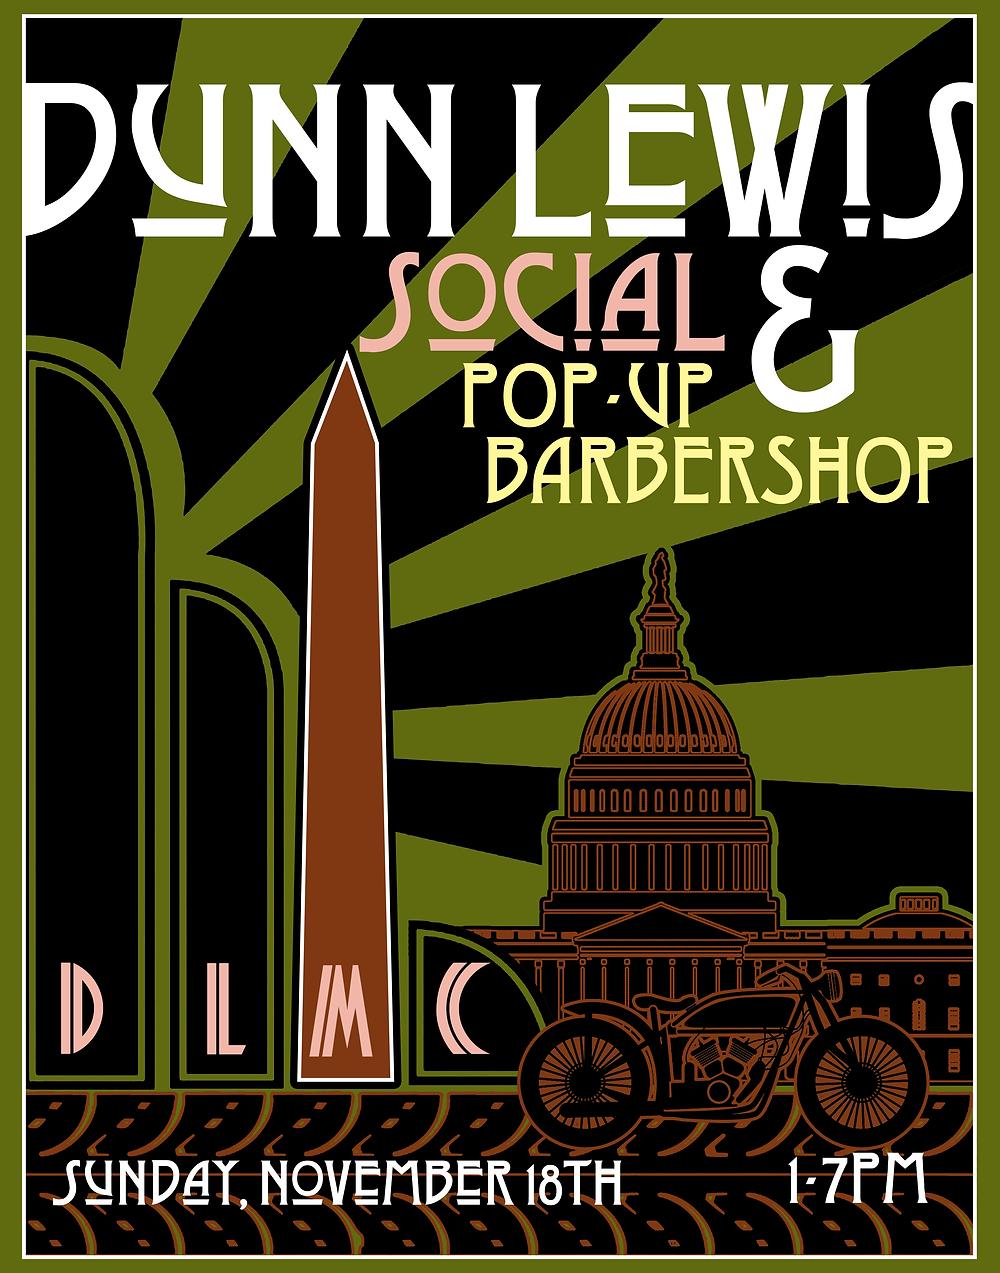 DUNN LEWIS, Motorcycle Shop, Washington DC, Event, DIY Garage, Pop up, barber shop, MotoGP, party